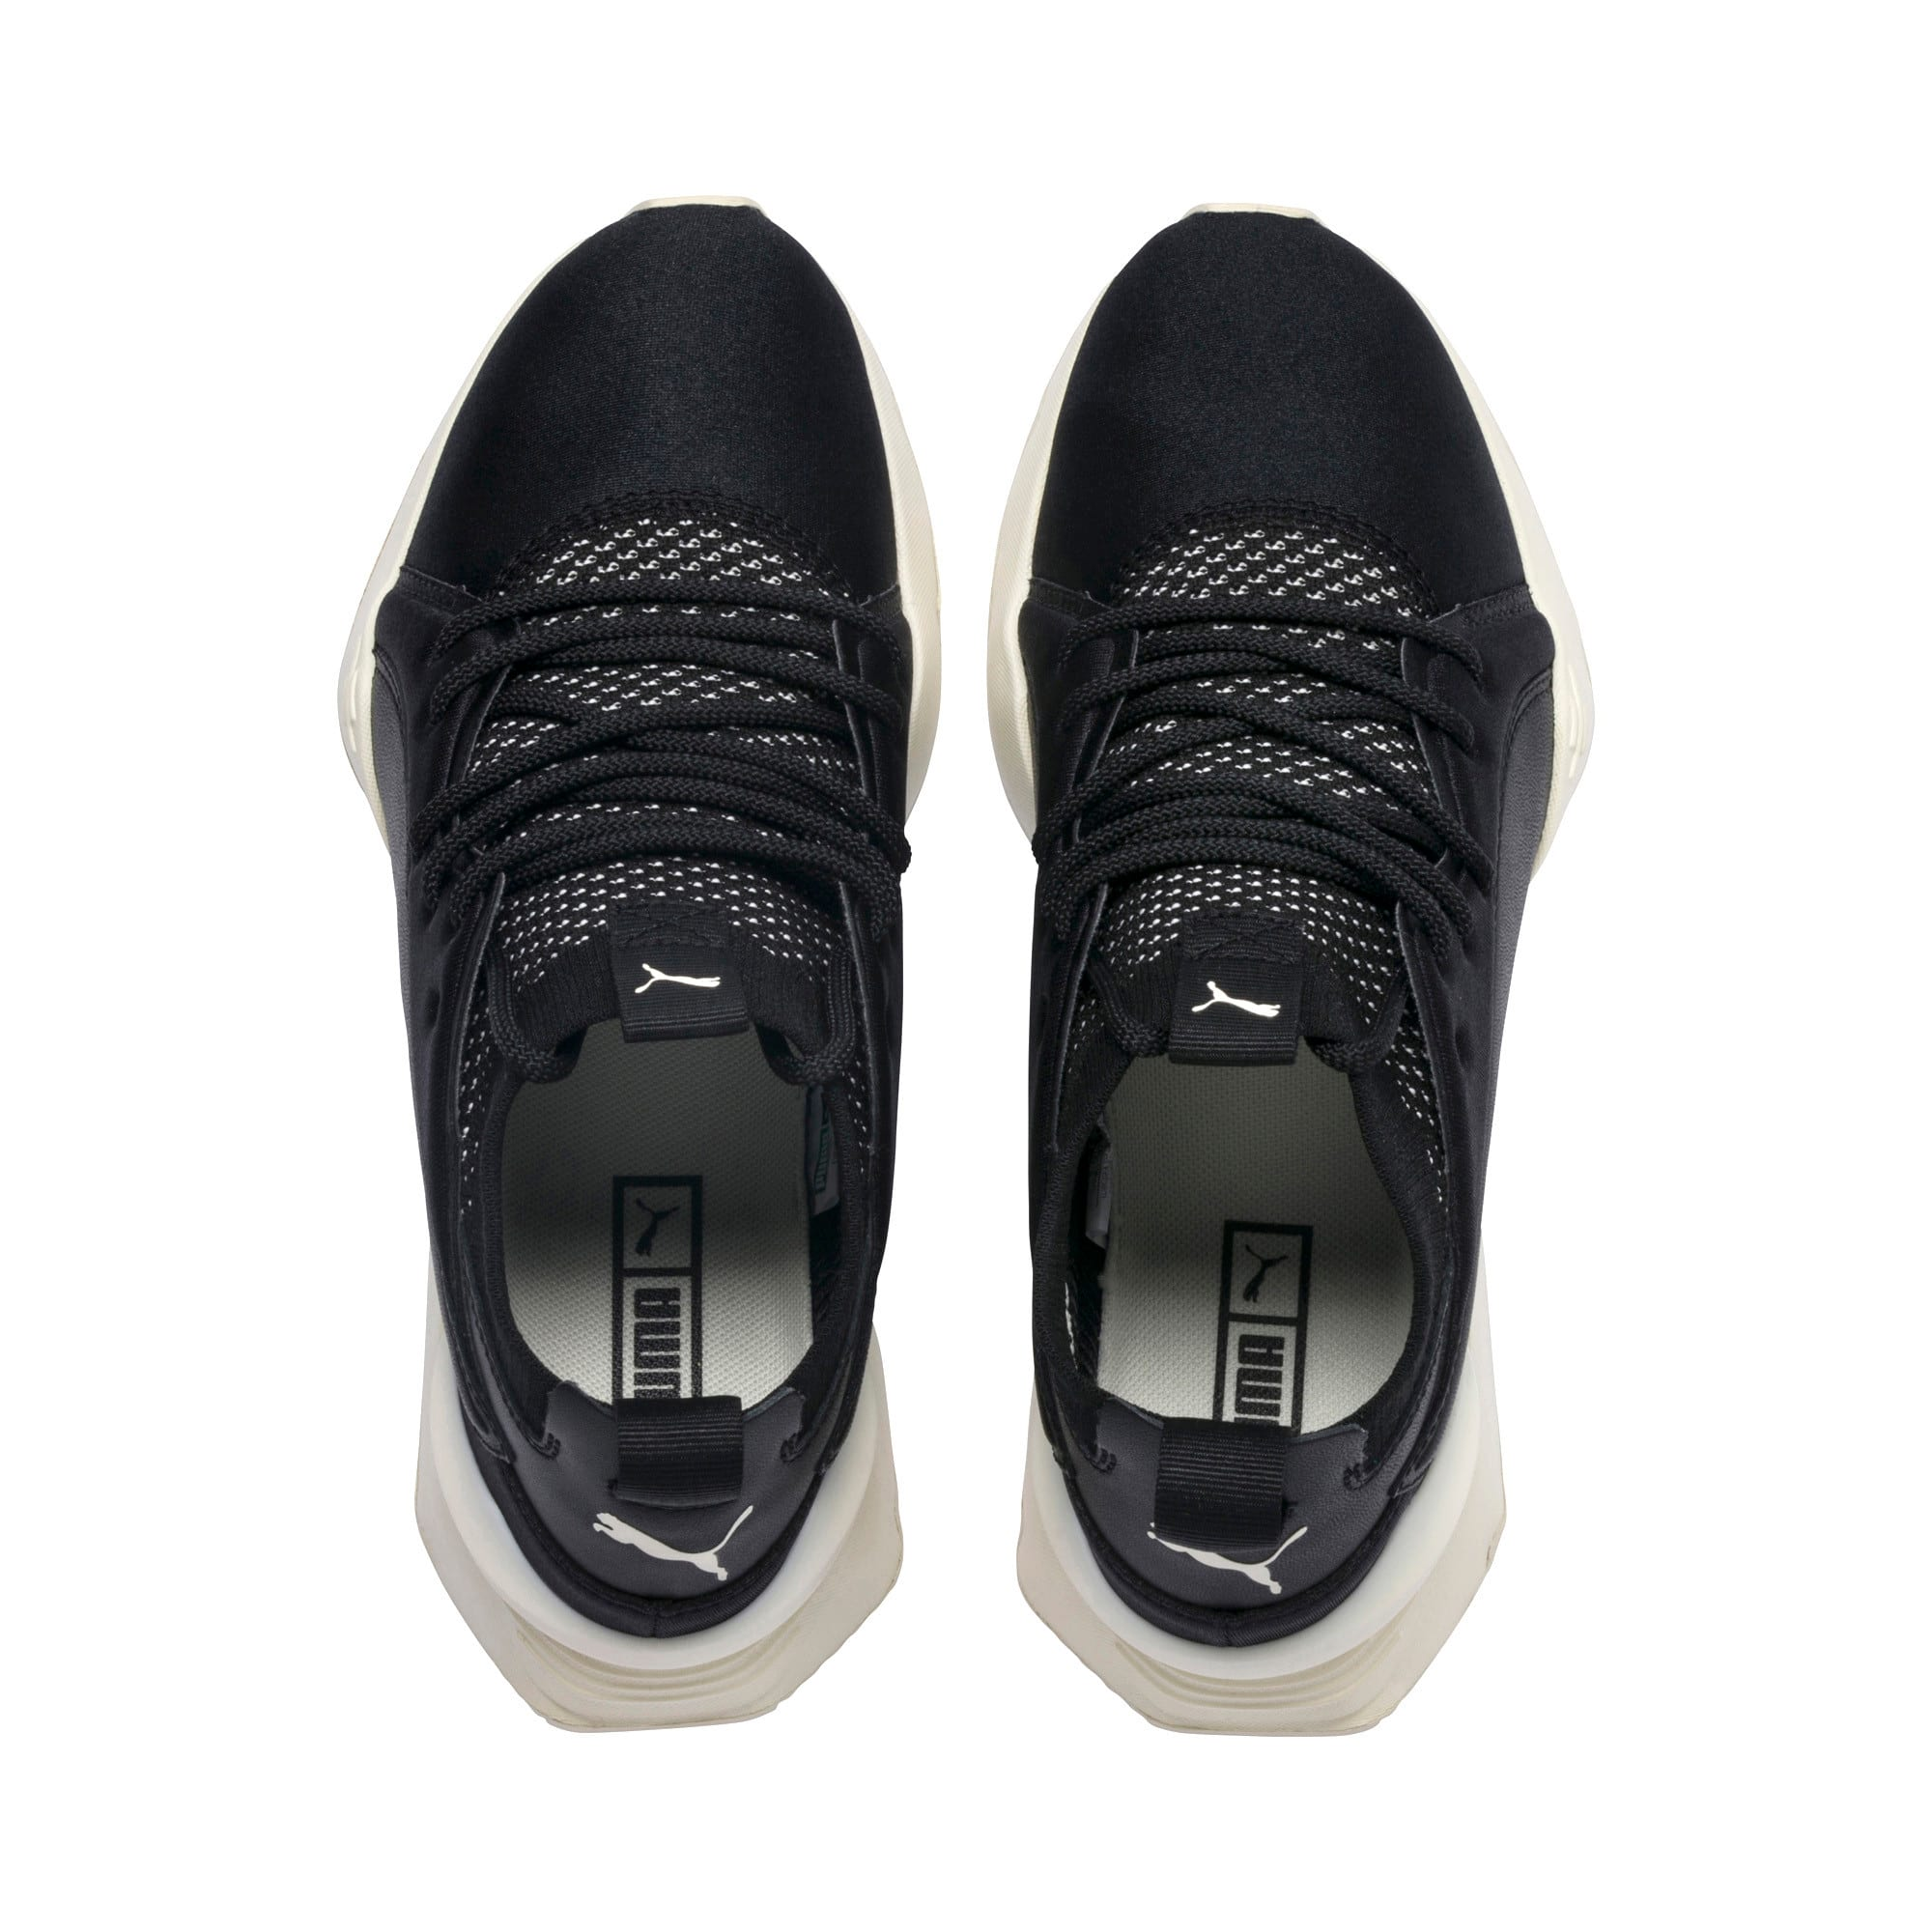 Thumbnail 7 of Muse Maia Knit Premium Damen Sneaker, Puma Black-Whisper White, medium